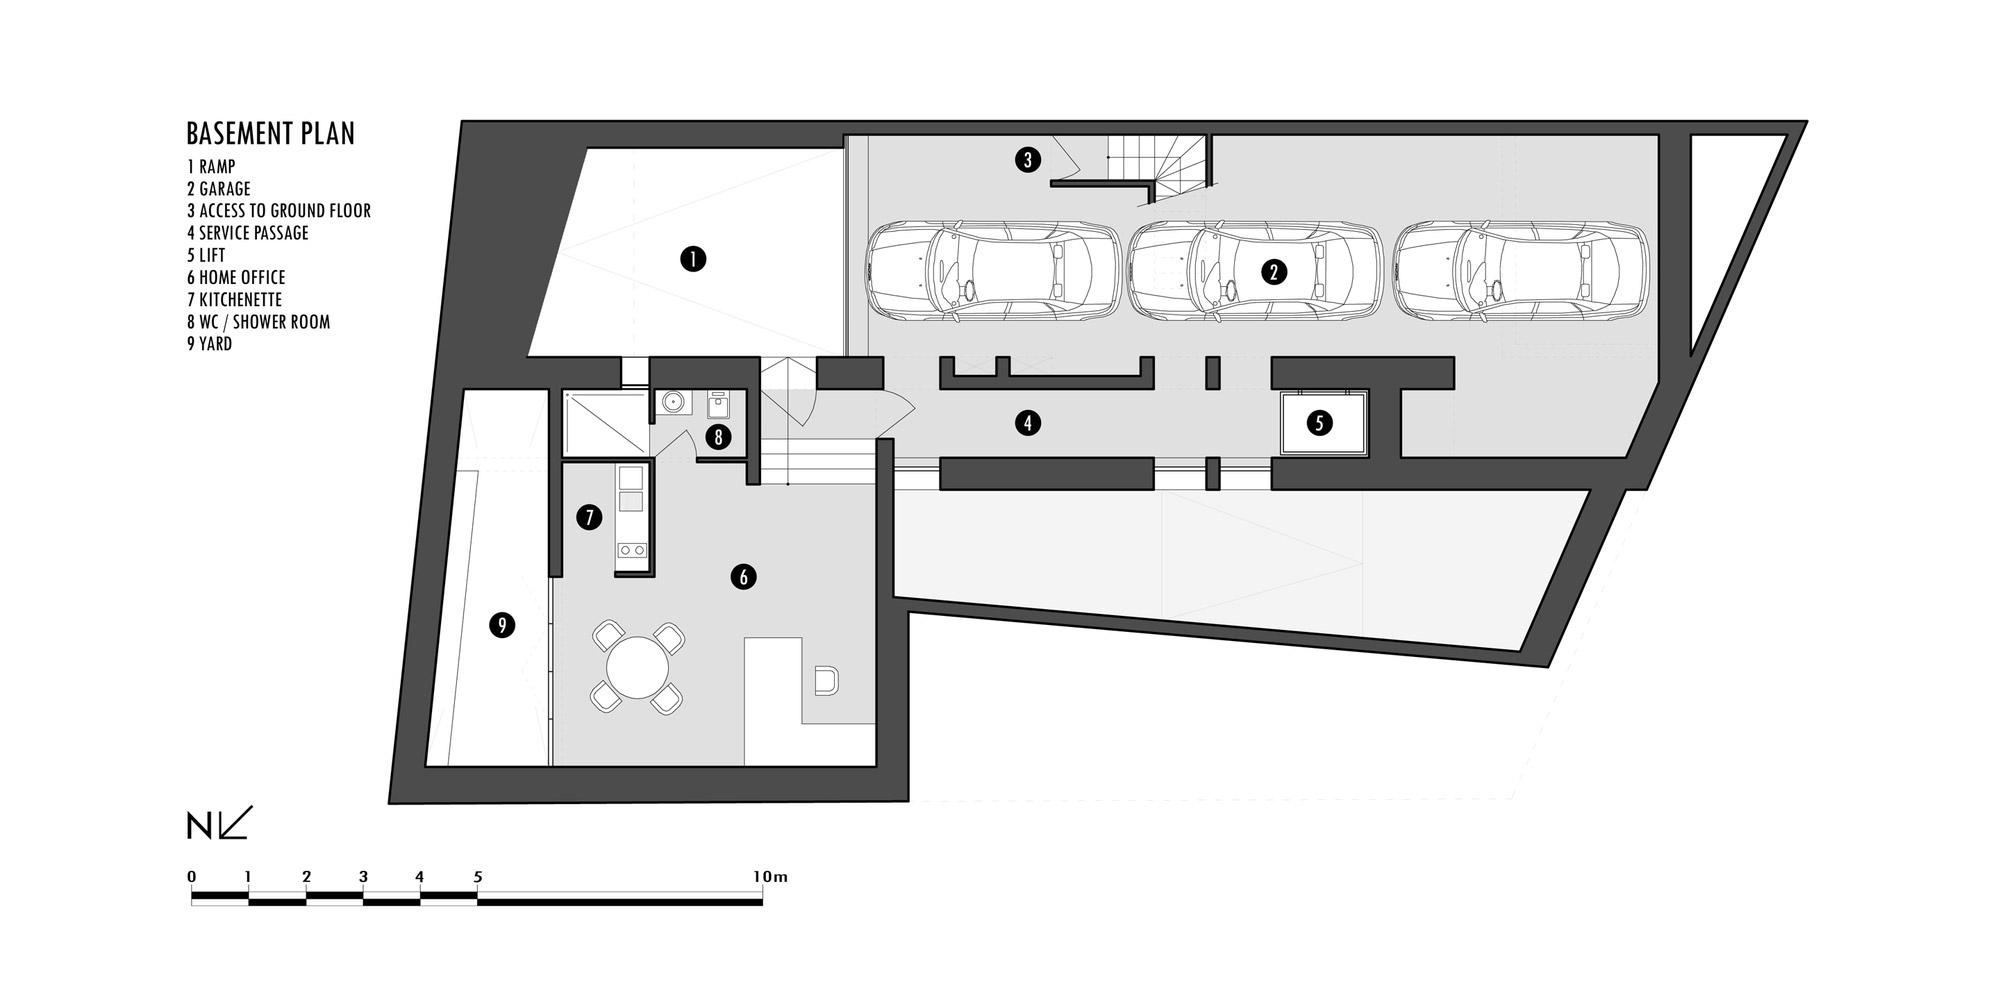 Basement Plan, Hanging Home in Naxxar, Malta by Chris Briffa Architects